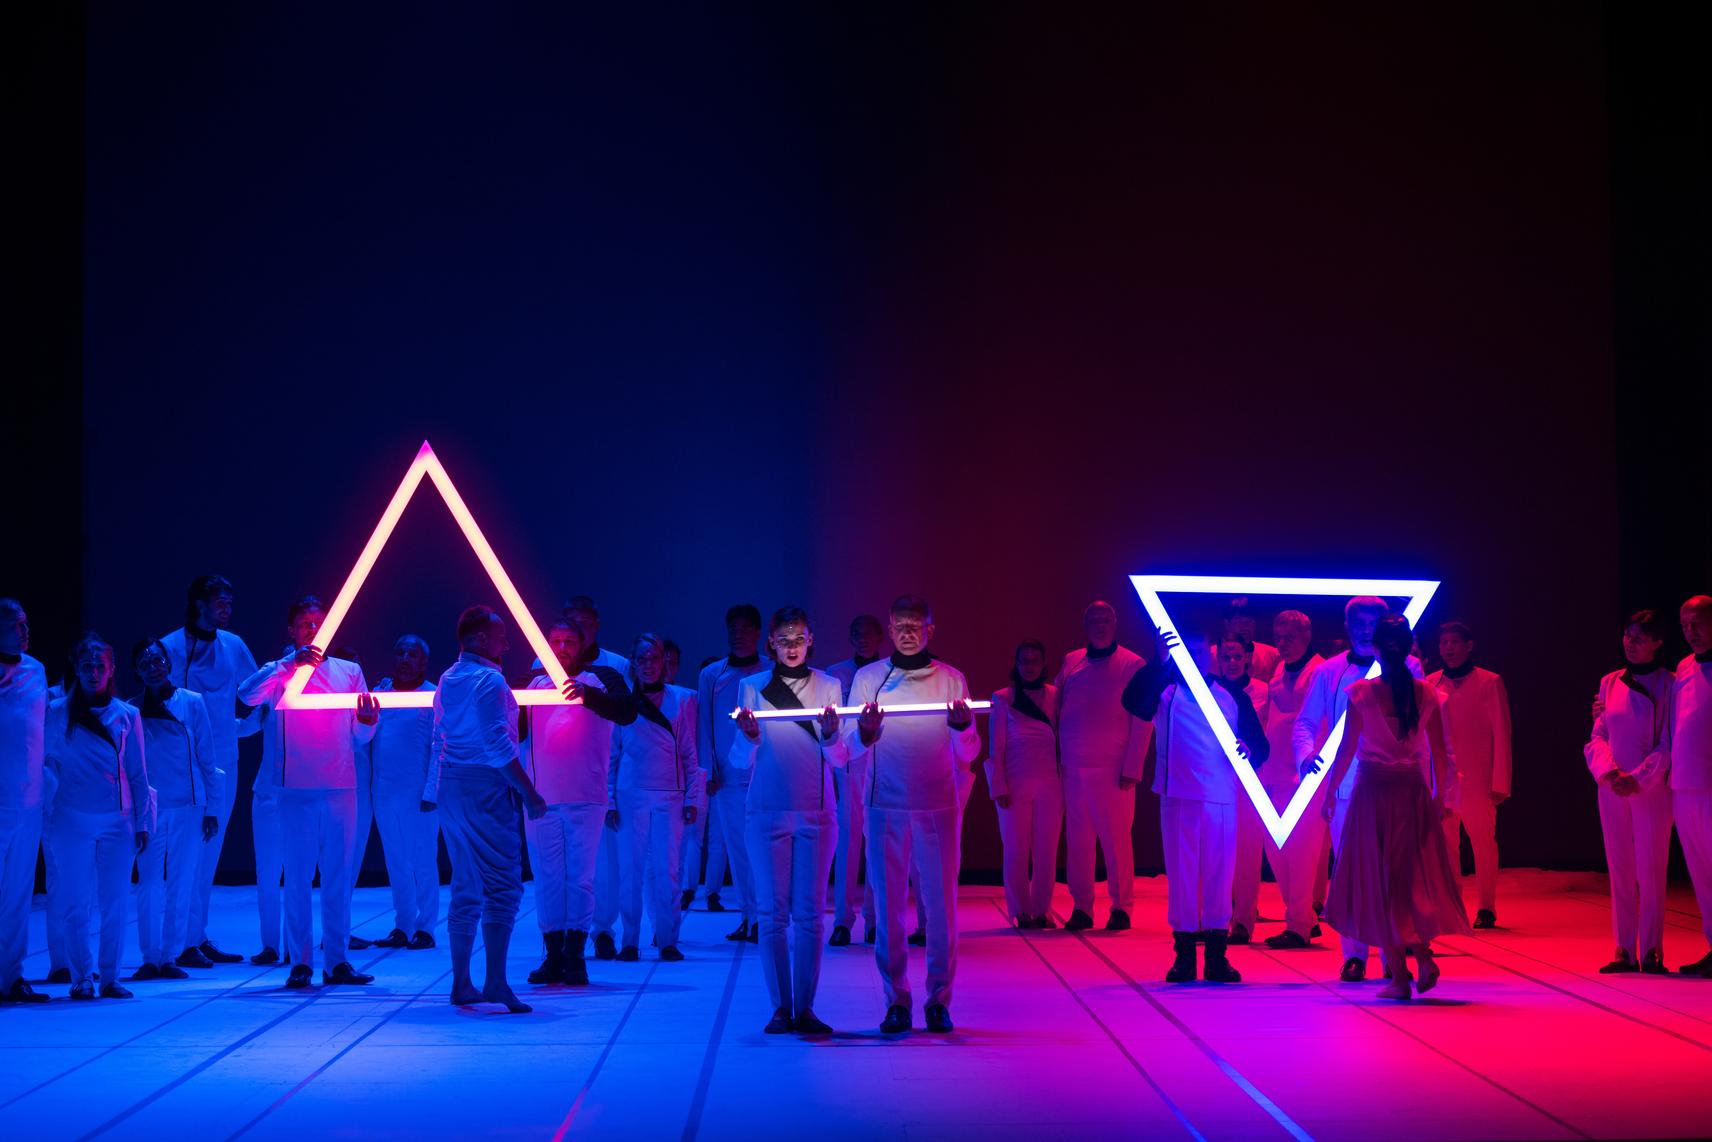 Mankica Kranjec, Slovenia: Blue Is Not Red, 2019, Choir of the Slovenian National Theatre Opera and Ballet Ljubljana, Slovenia - Illustrative elements of the magnificent scene. W. A. Mozart: The Magic Flute, season 2019/2020.